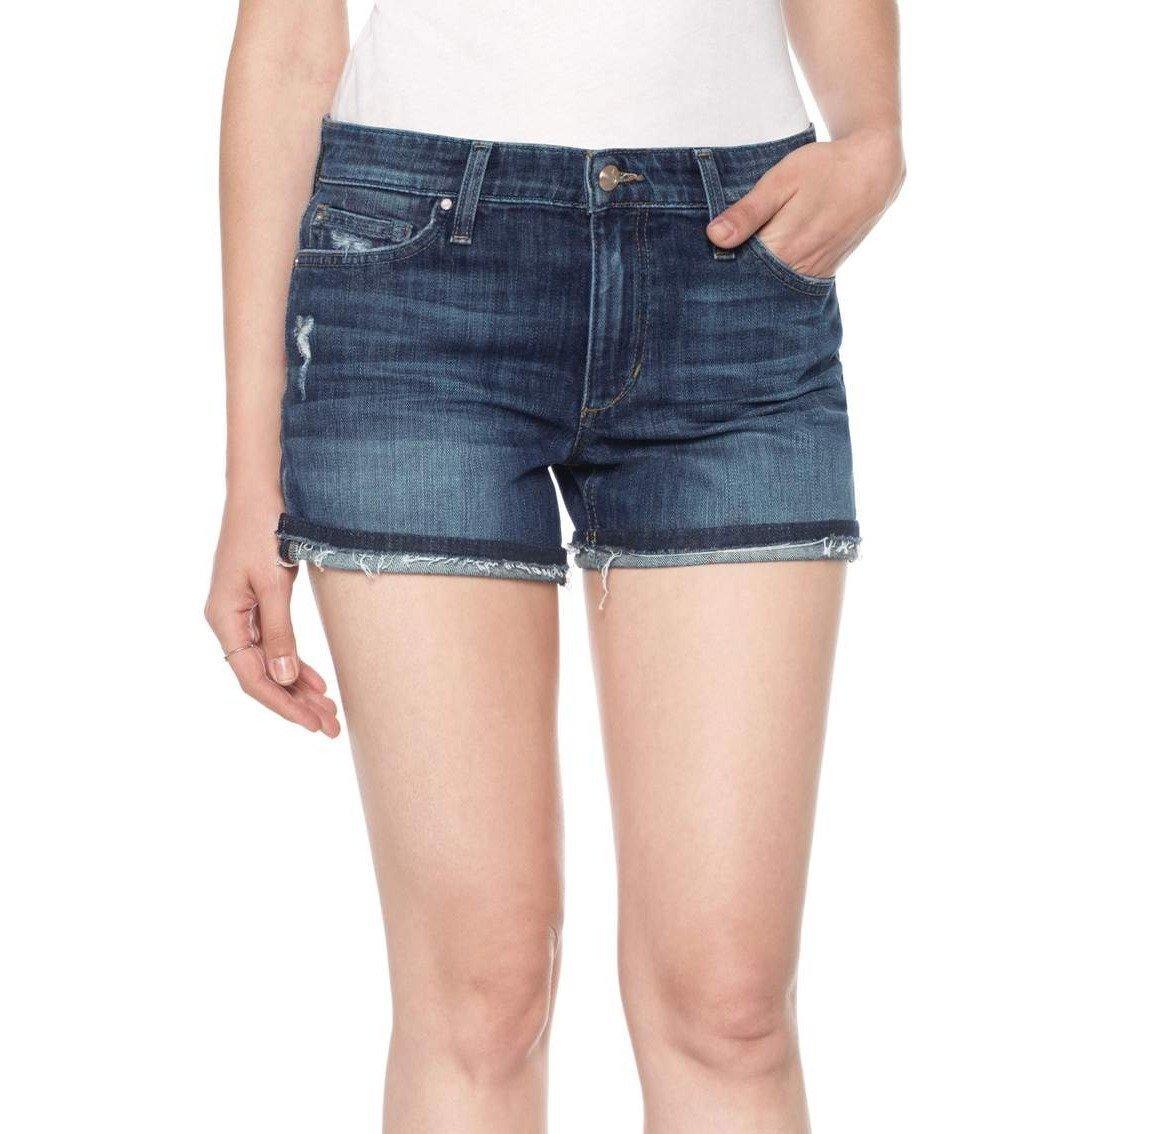 Joe's Jeans Women's Markie Rolled Hem Shorts, Destructed Medium Blue, 31